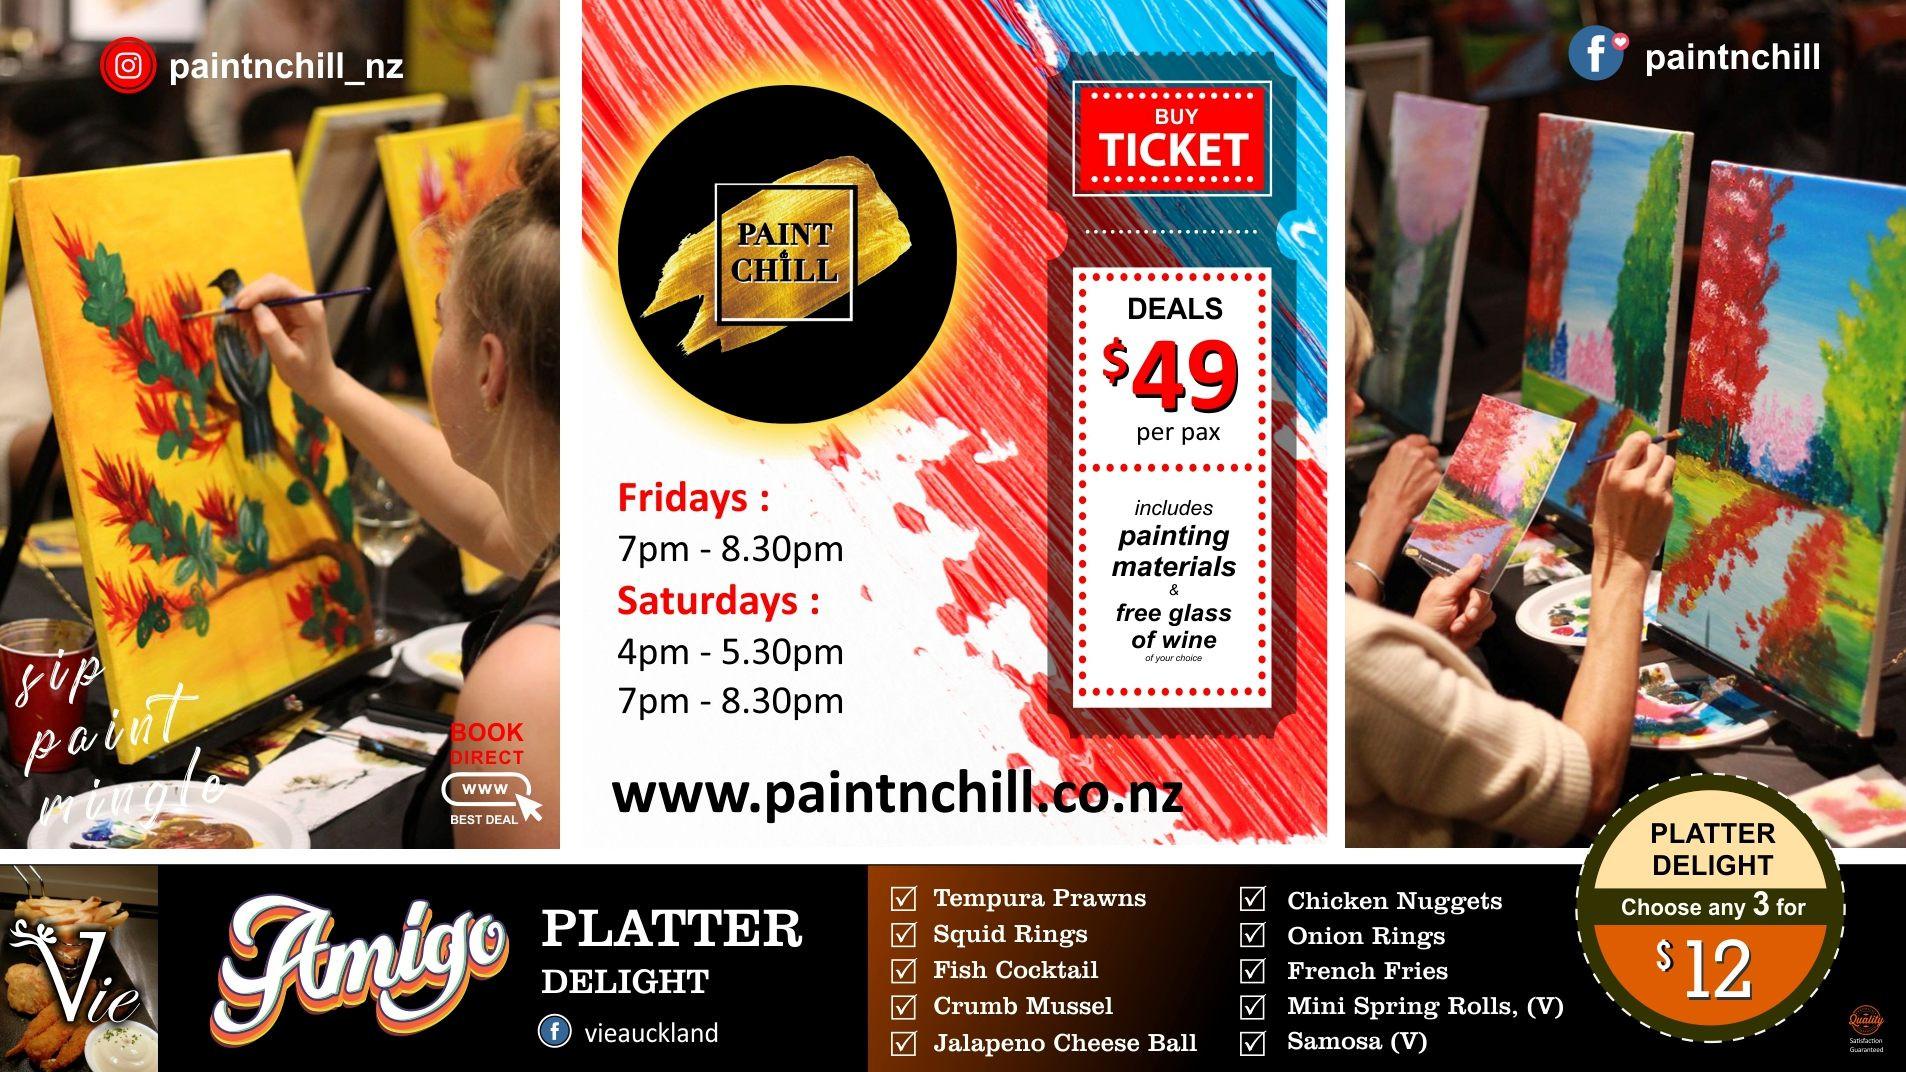 Paint & Chill Promo 2020 fhd.jpg